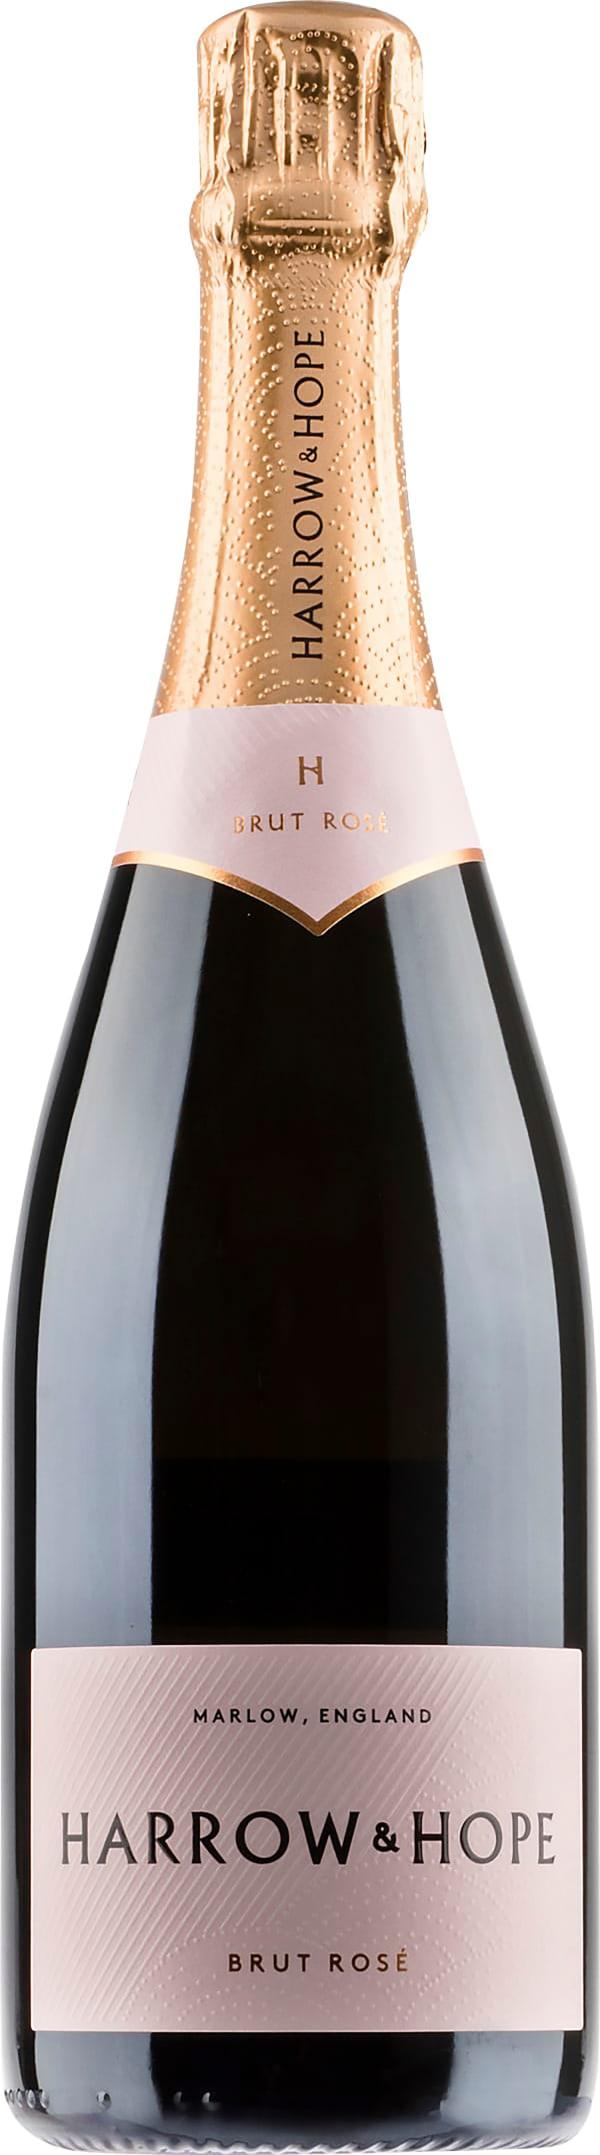 Harrow & Hope Rosé Brut